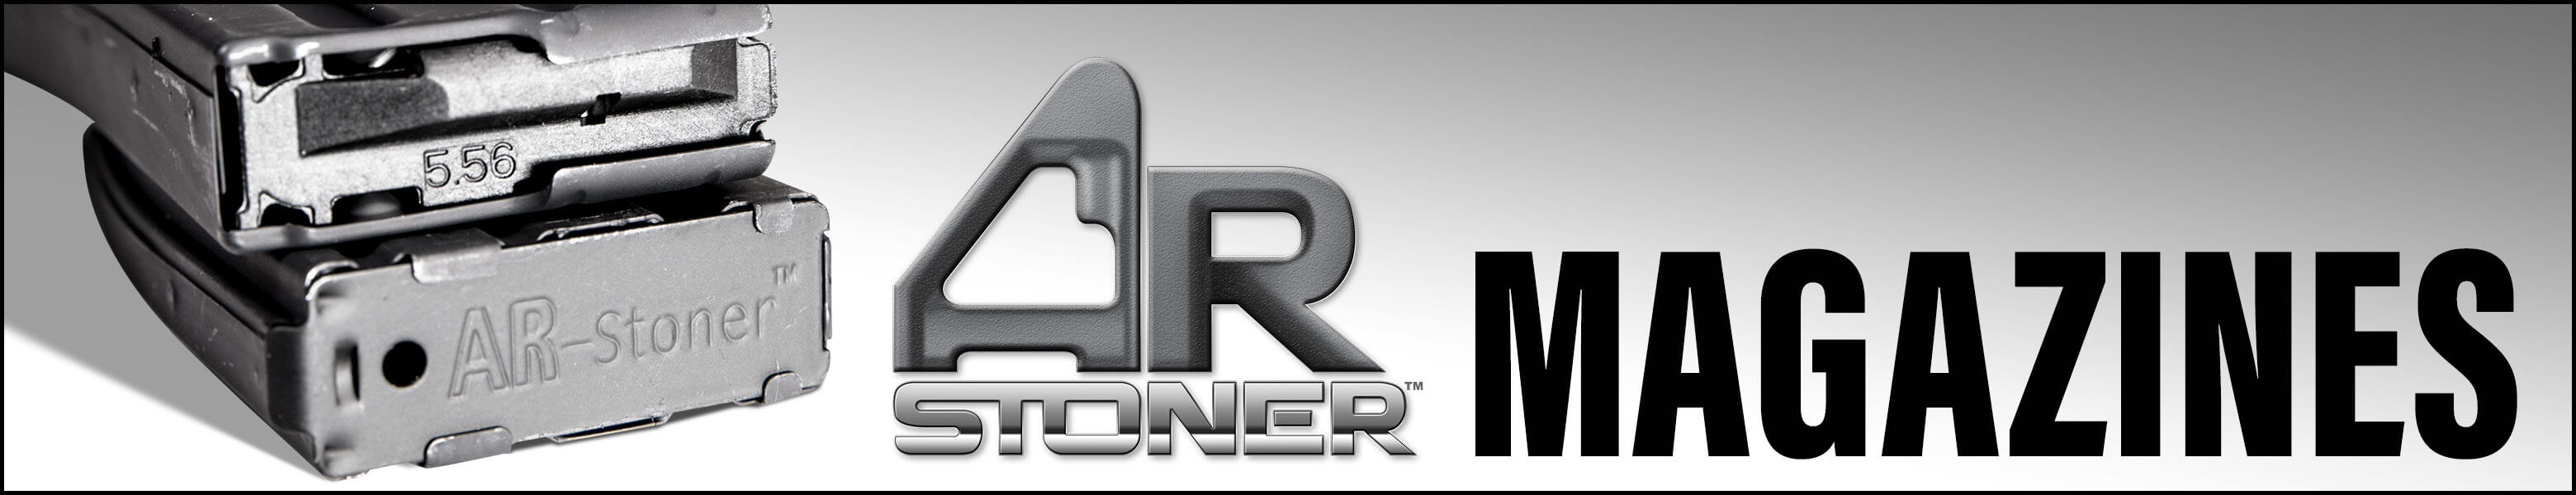 AR-Stoner Magazines